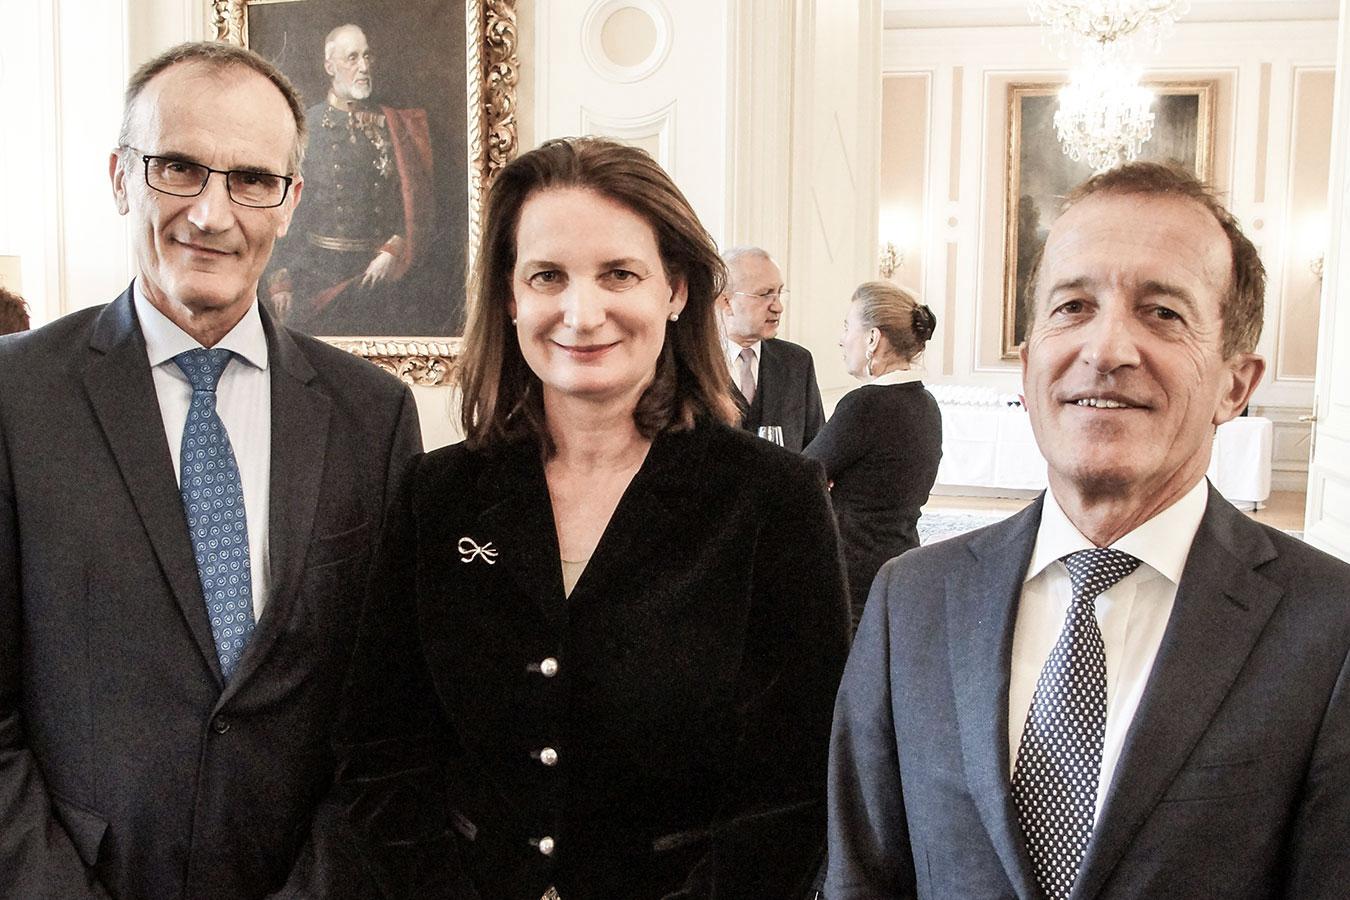 ch-hambuch-dora-szemrevalo-sehenswert-2018-ambassador-wenzel-ellison-parker-burkhard.jpg